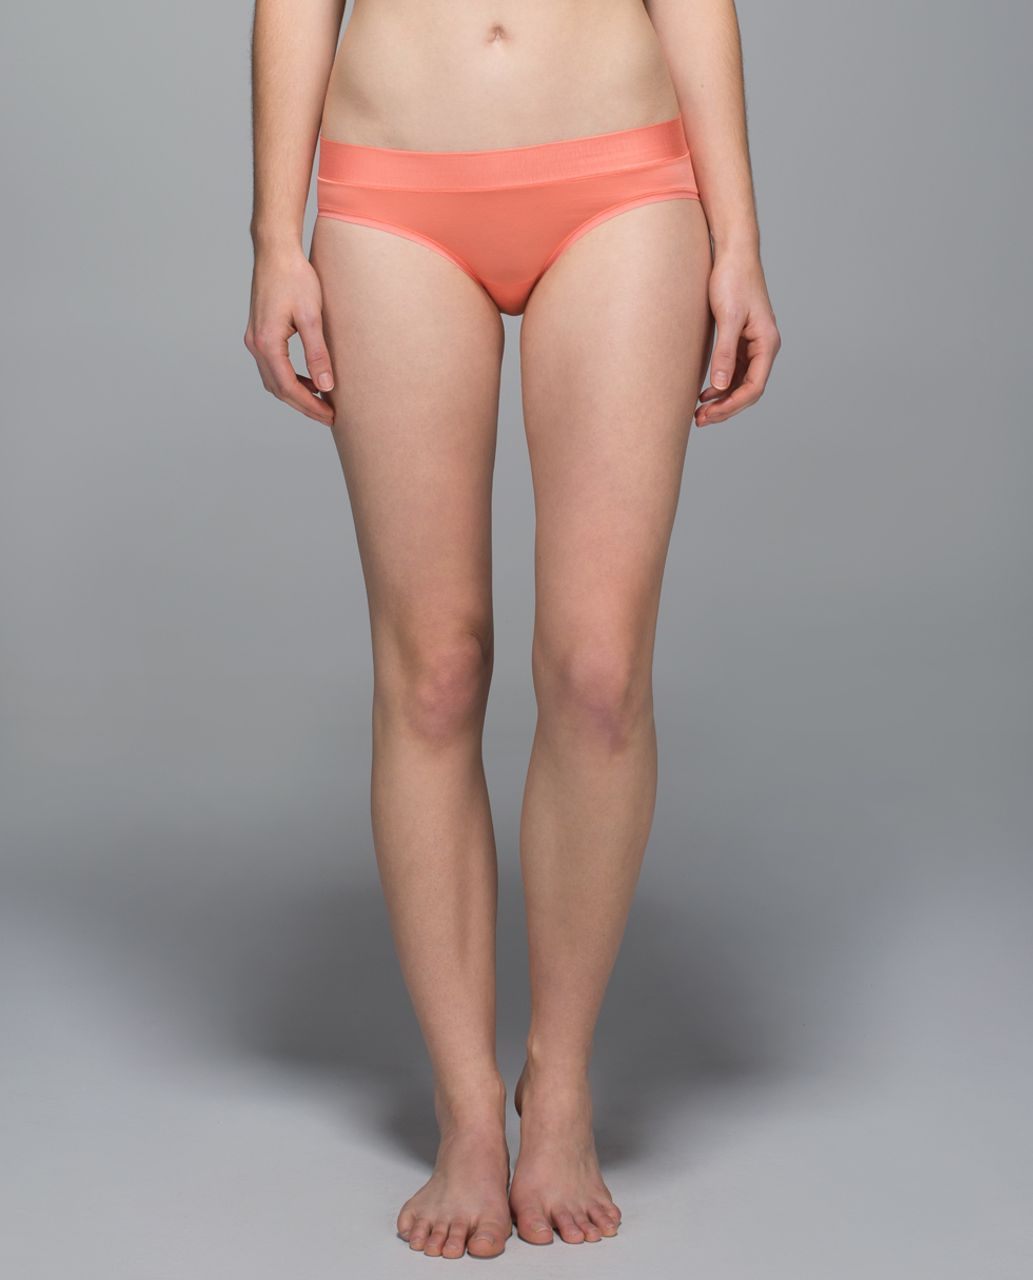 Lululemon Mula Bandhawear Bikini - Plum Peach